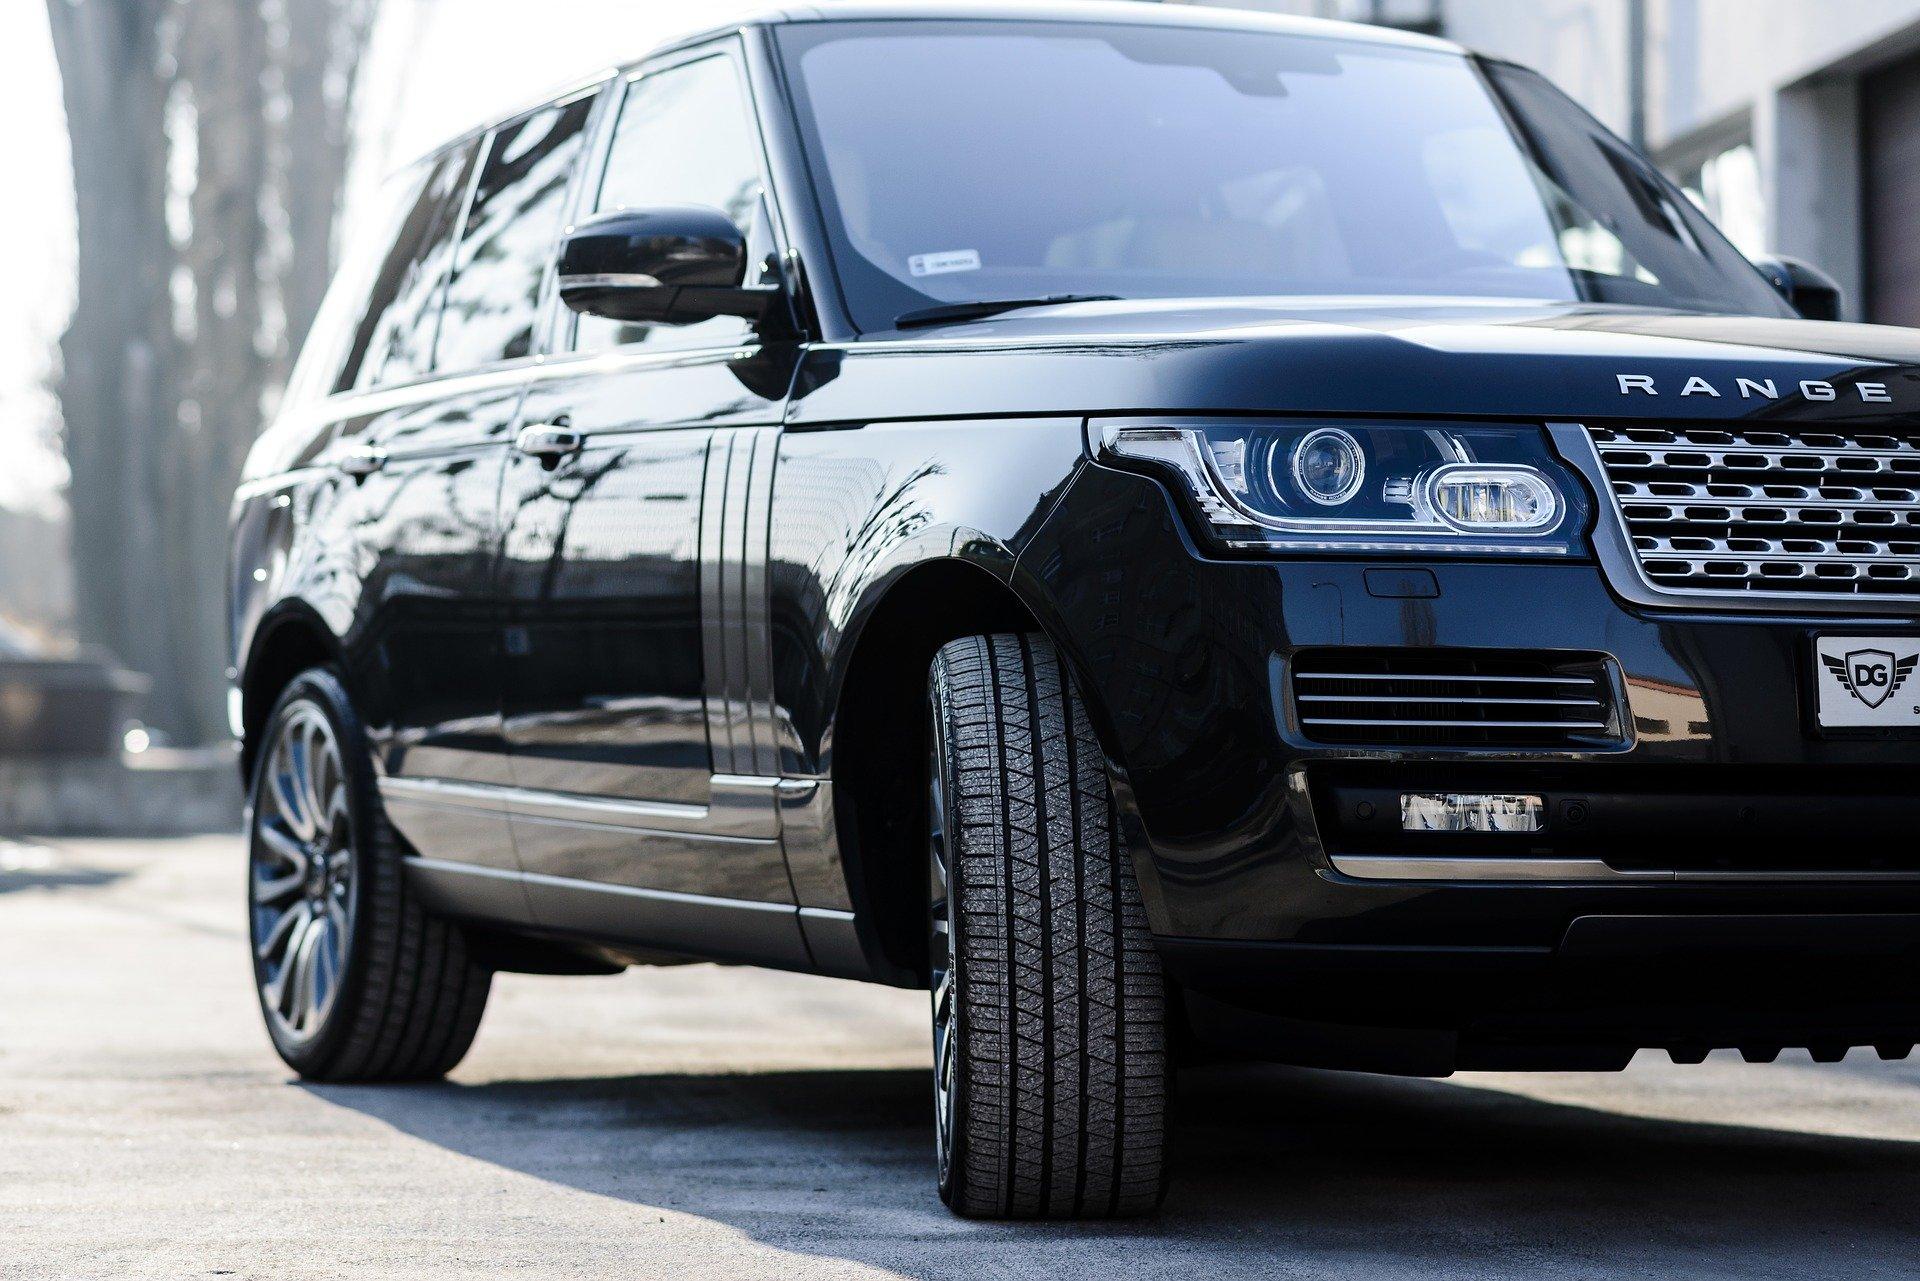 4×4 tyre sales down 6%